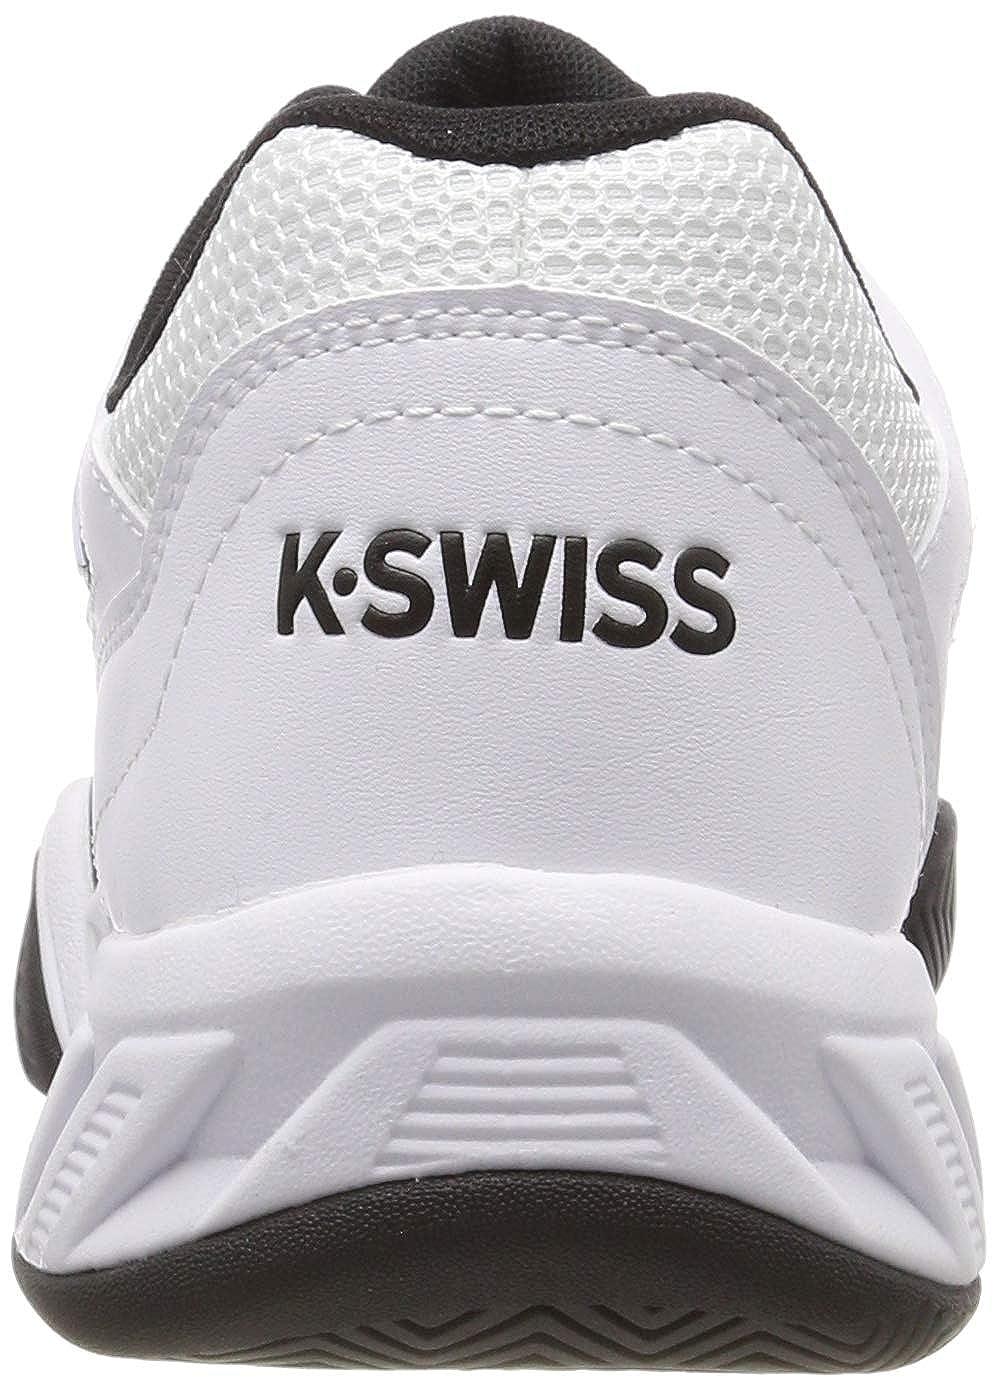 K-Swiss Performance Bigshot Light 3, Zapatillas de Tenis para Hombre, Blanco (White/Black 129M), EU